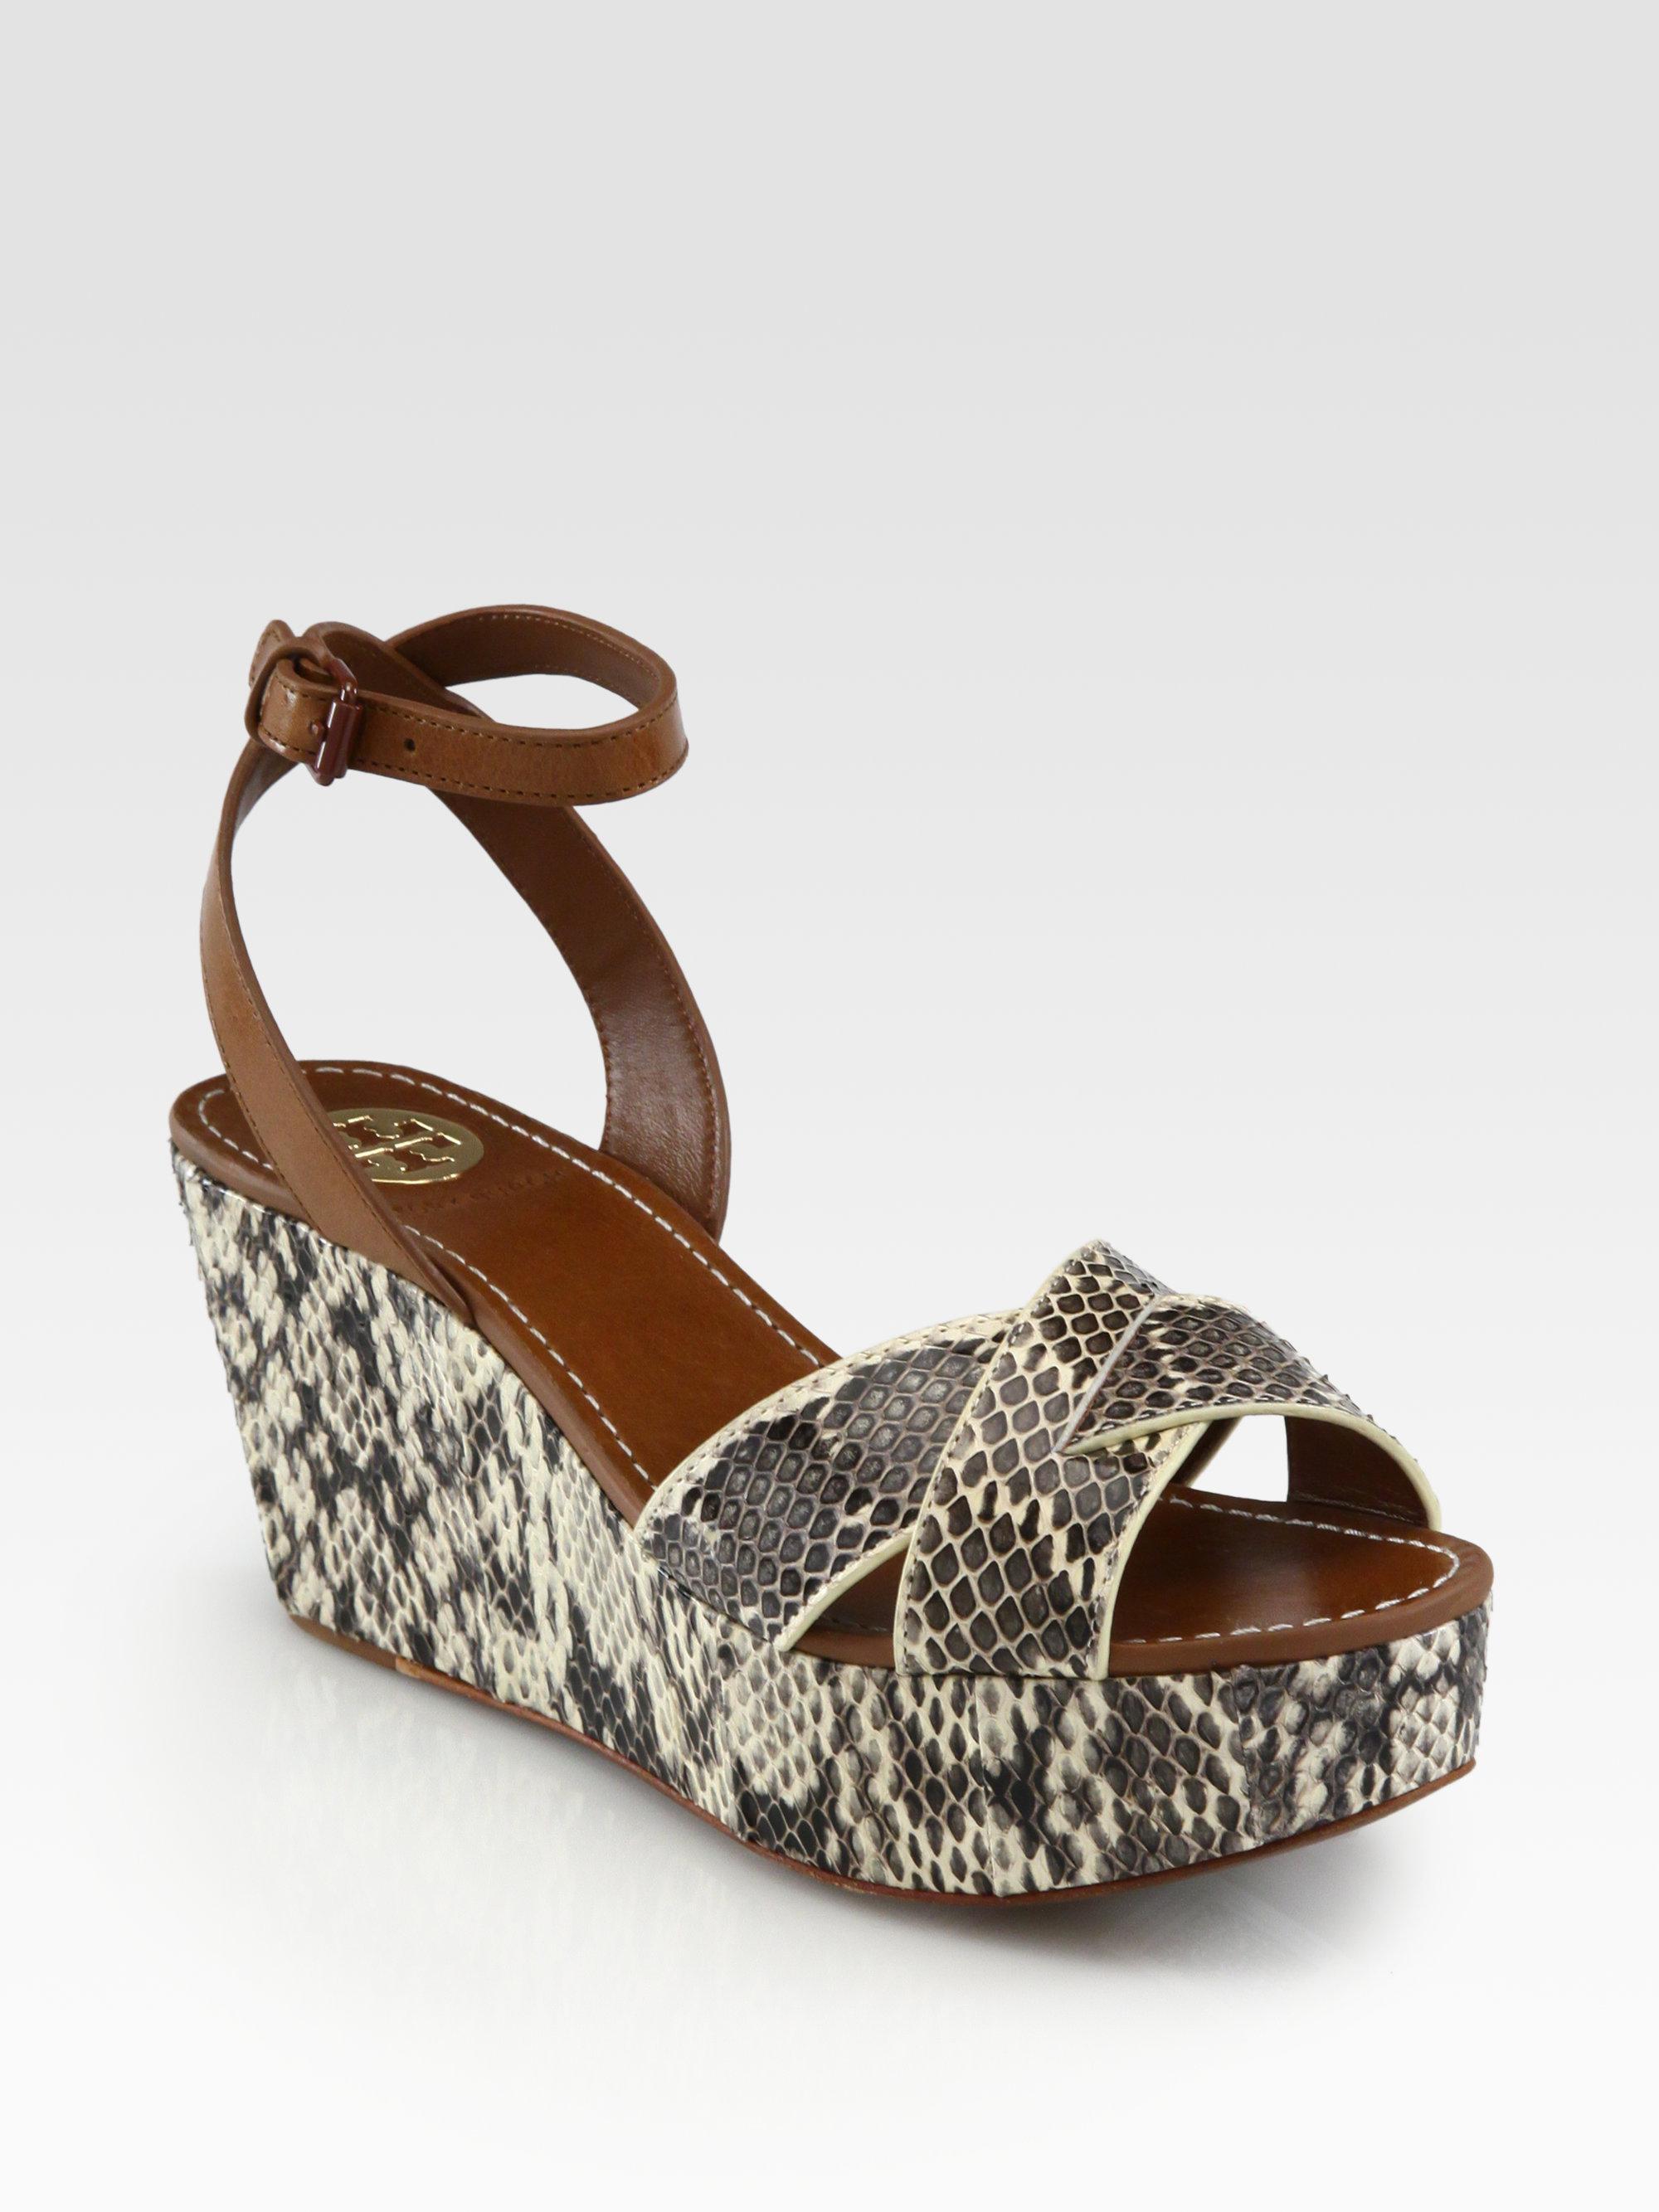 eba3cf103984 Lyst - Tory Burch Cathleen Snakeskin Leather Wedge Sandals in Brown